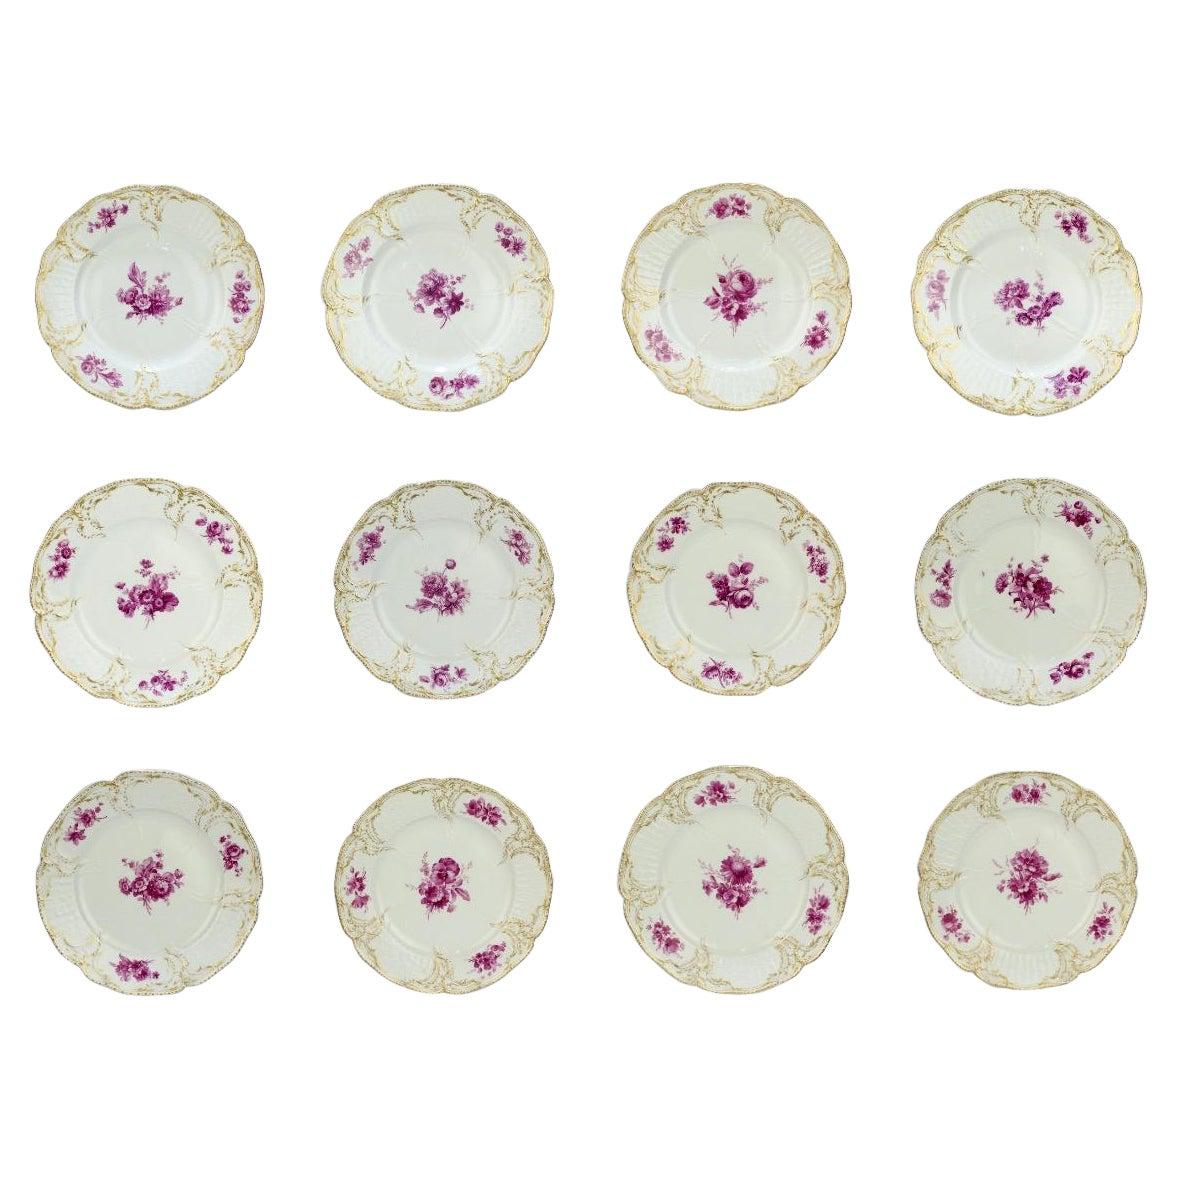 Set of 12 KPM Royal Berlin Porcelain Reliefzierat Dinner Plates in Puce